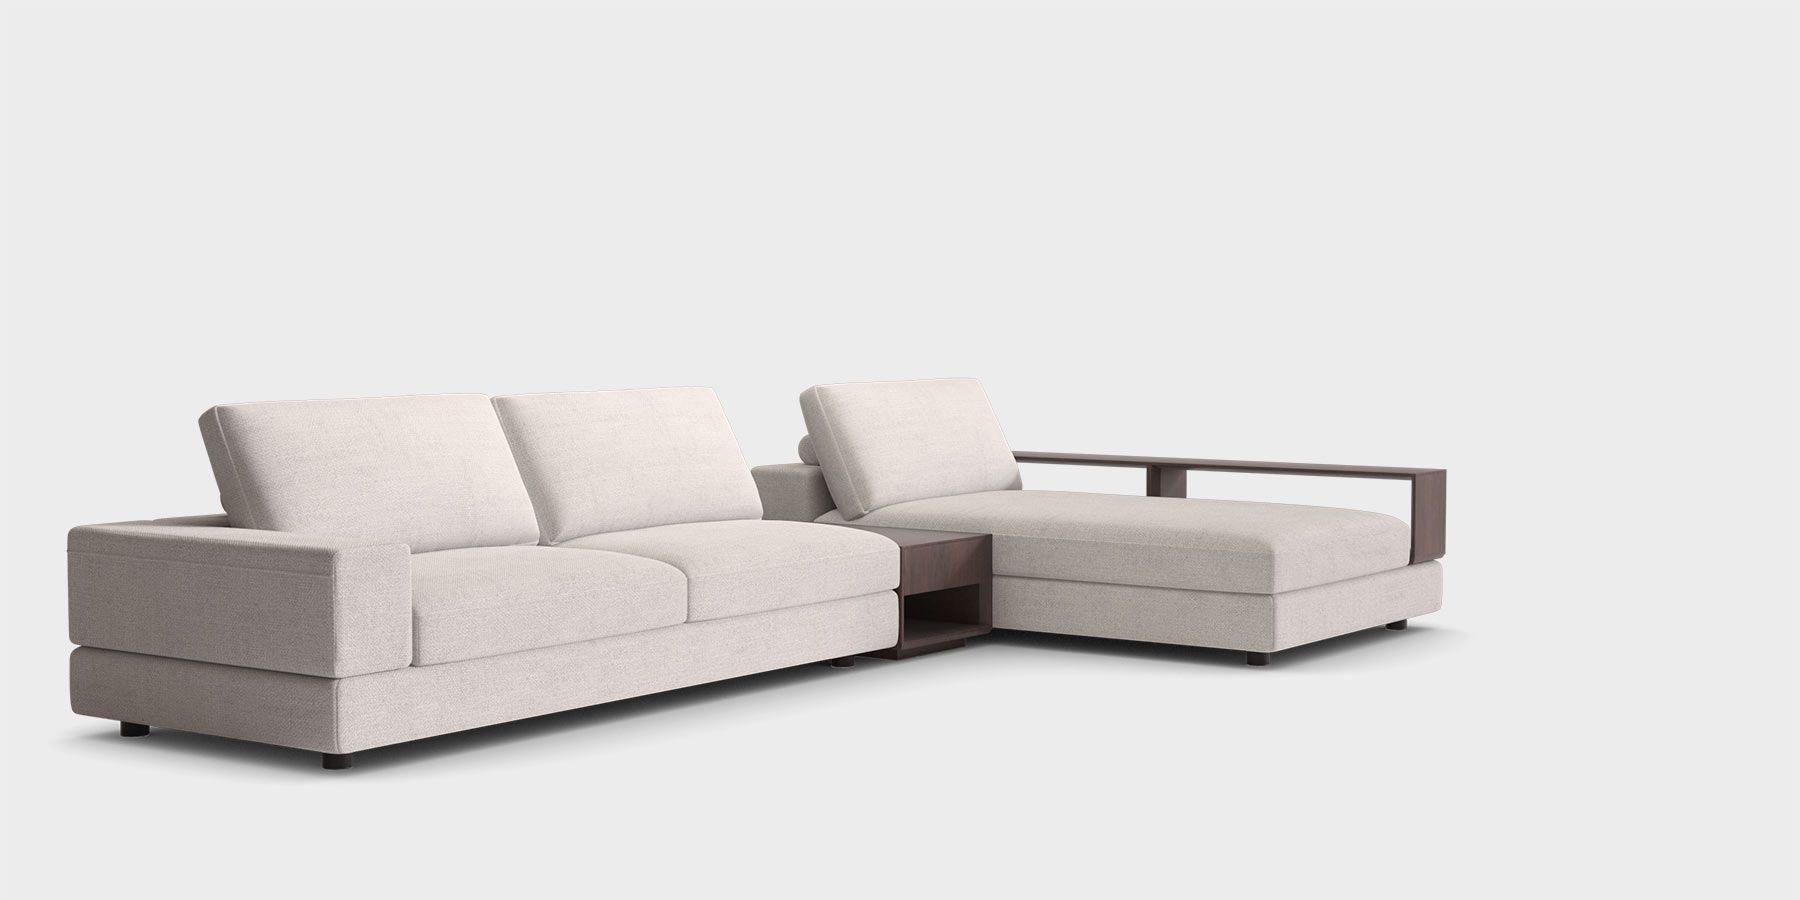 Jasper Modular Sofa Award Winning Design Modular Lounge Couch King Living In 2020 Modular Sofa Modular Lounges Lounge Couch